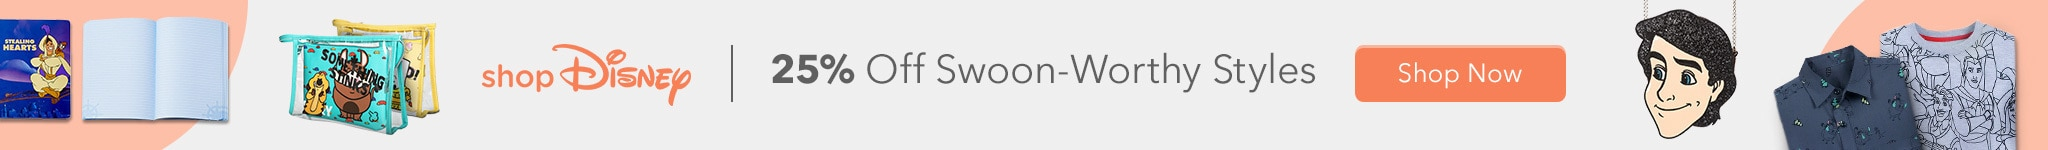 shopDisney 25% Off Swoon-Worthy Styles